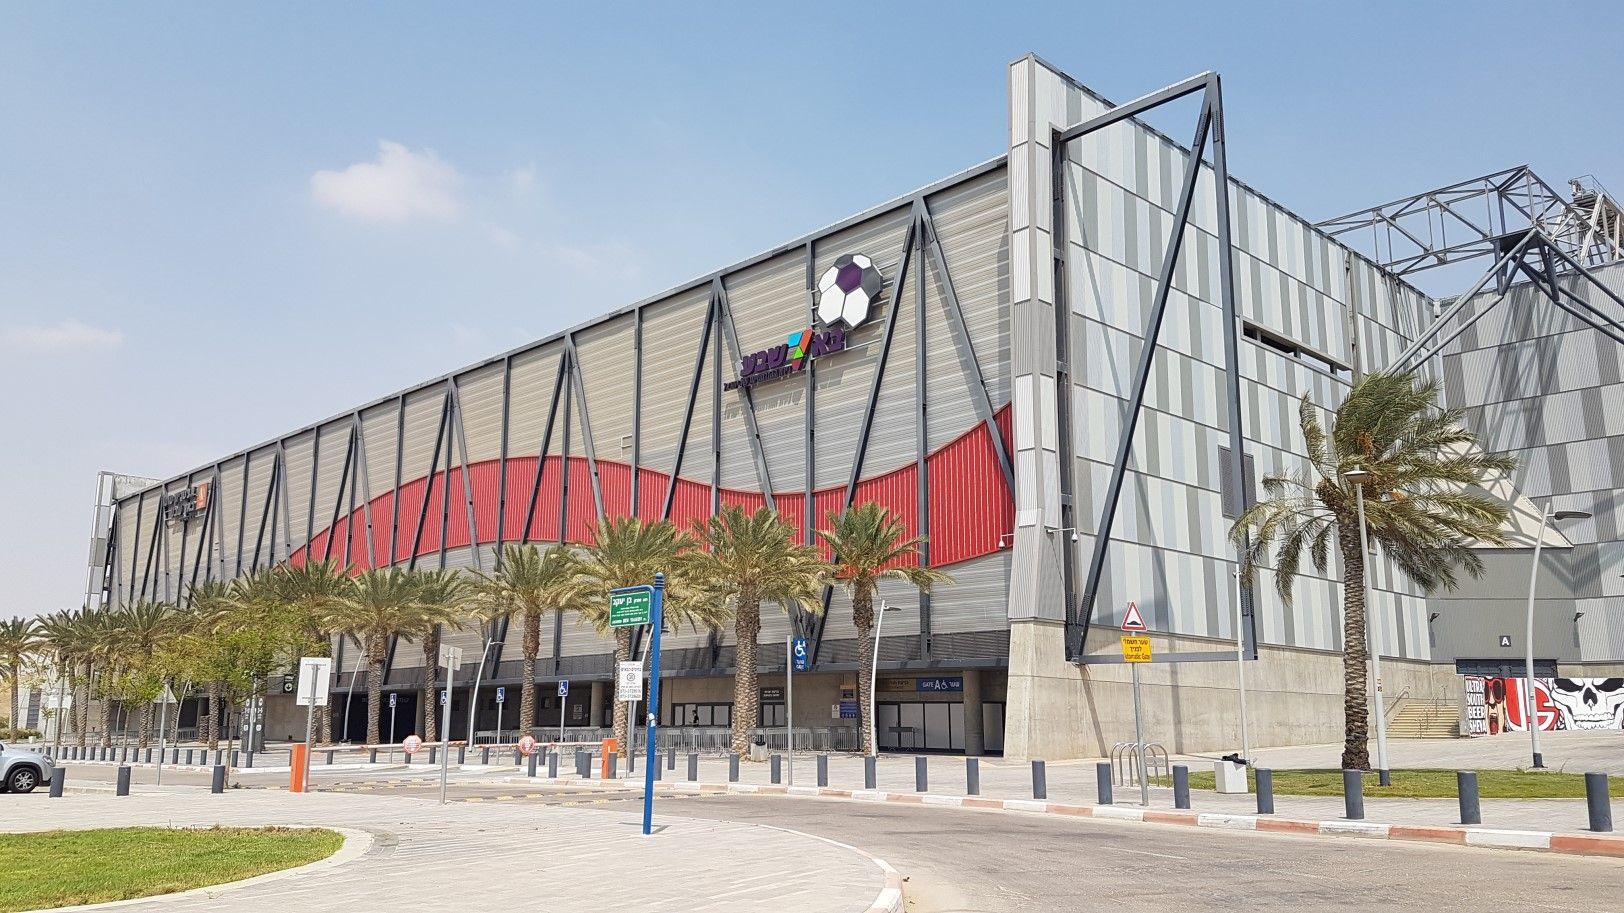 אצטדיון באר שבע